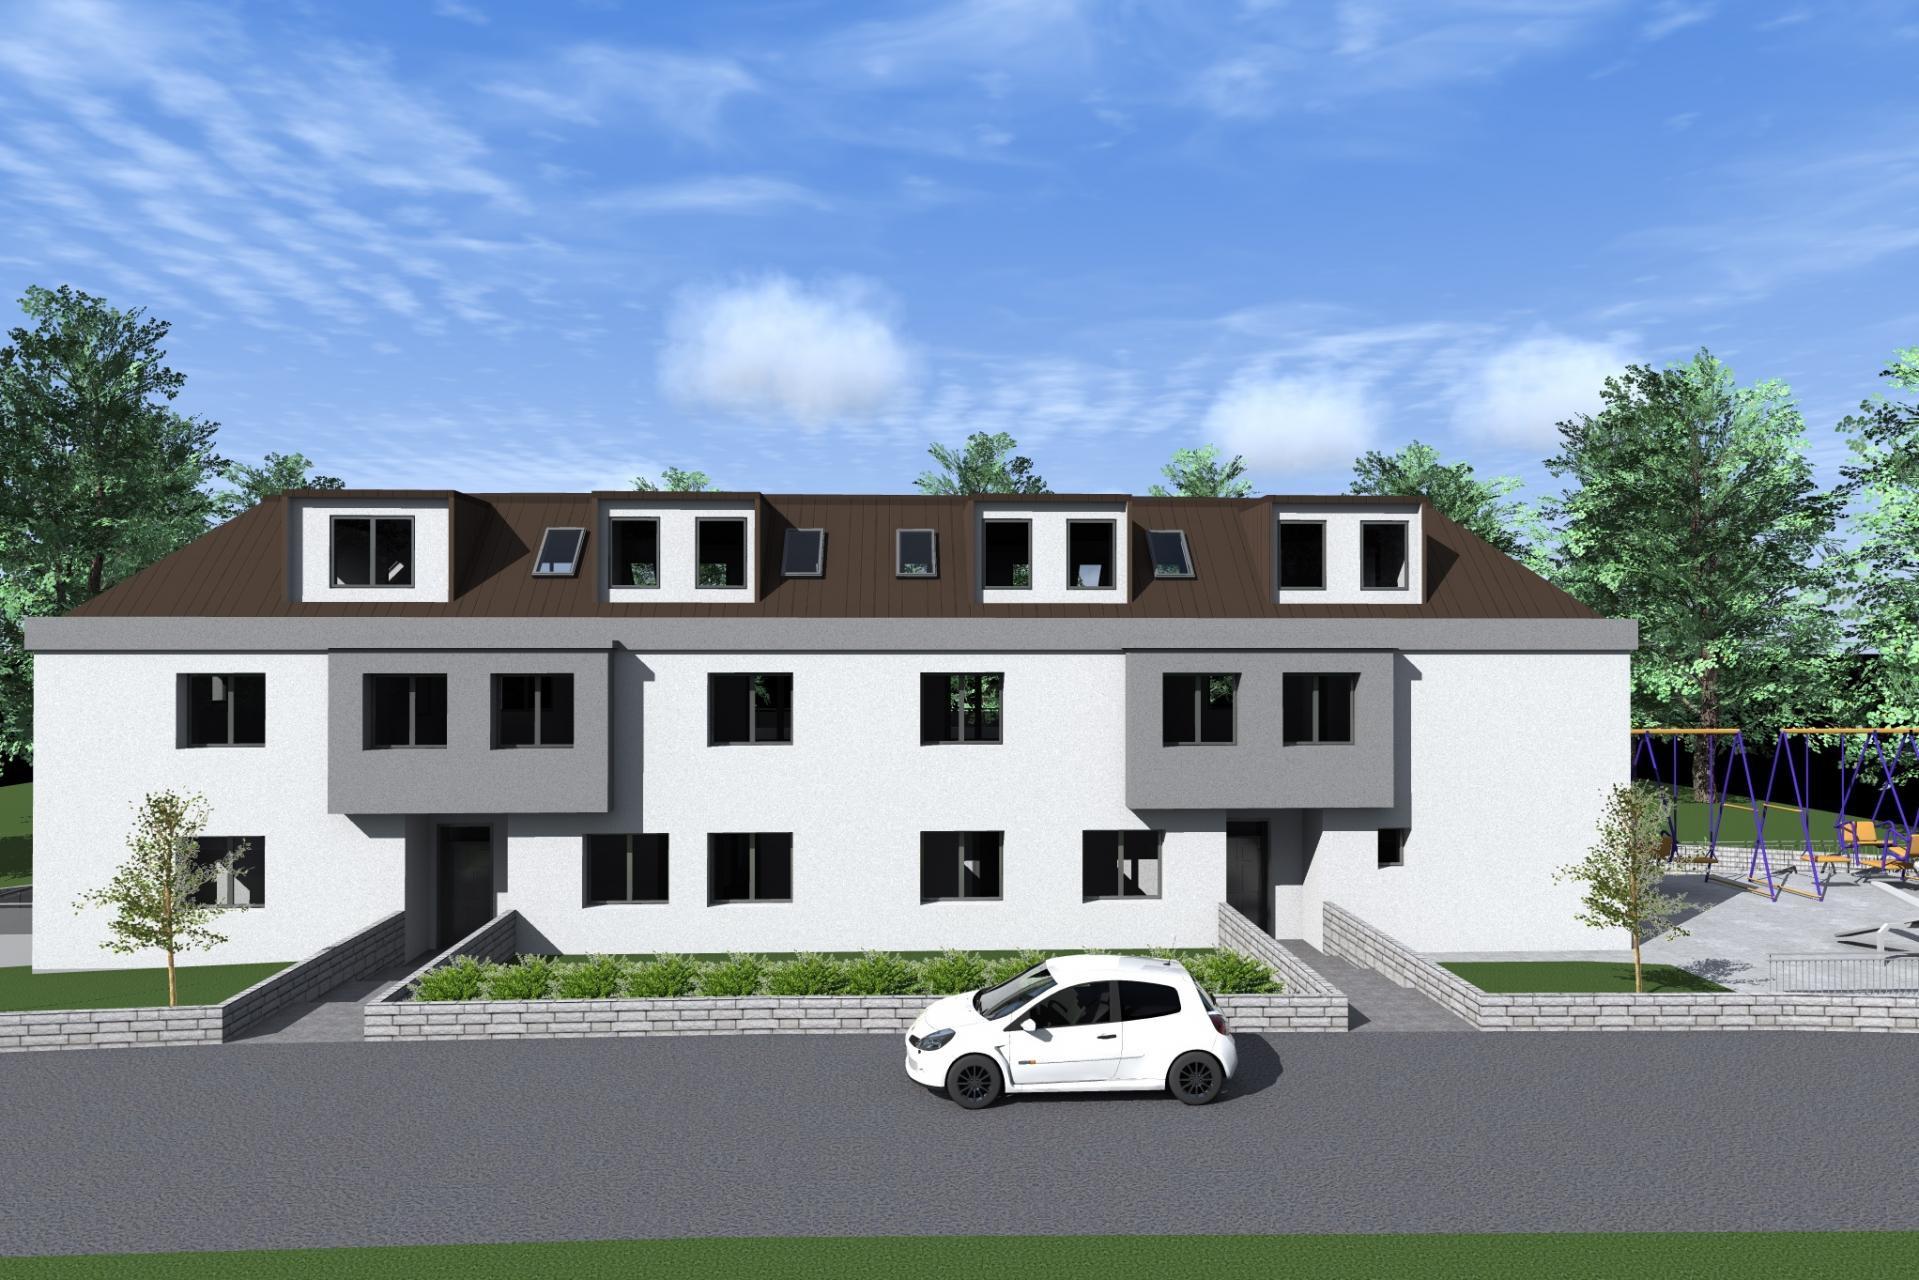 Sale Apartment - Lieler - Luxembourg